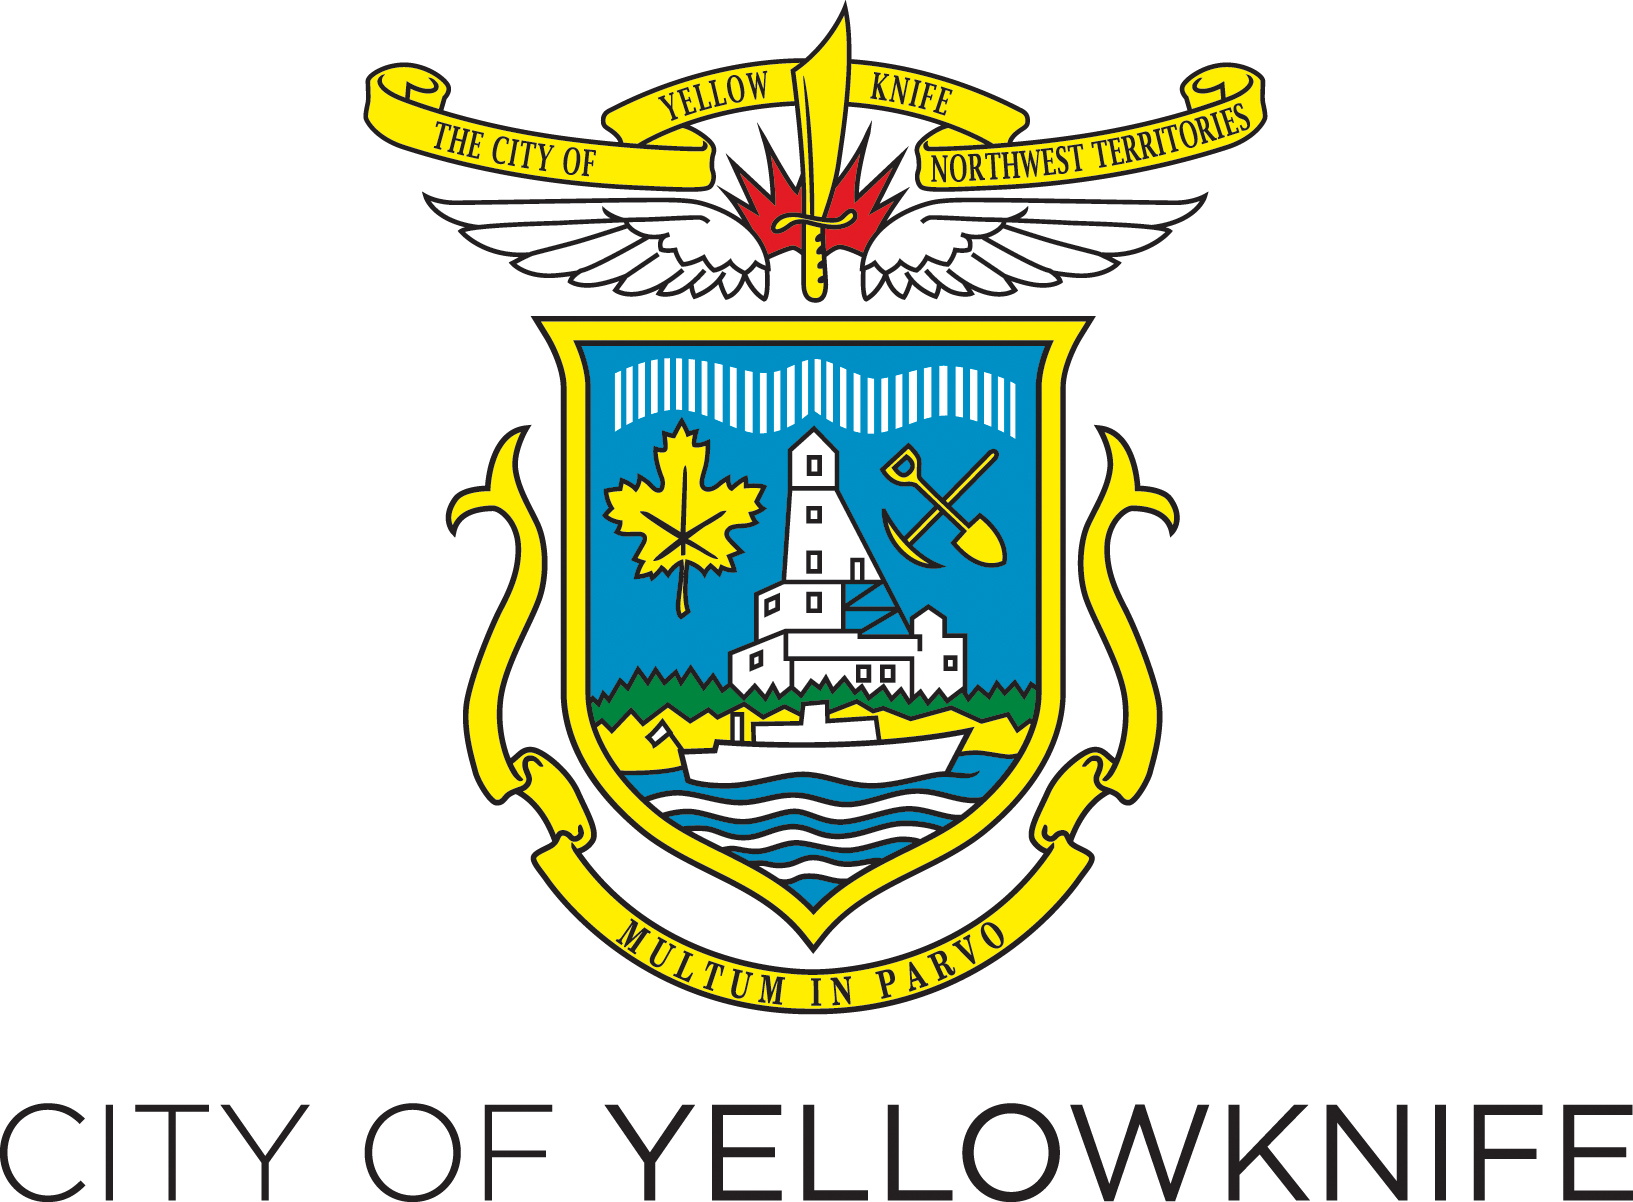 Yellowknife